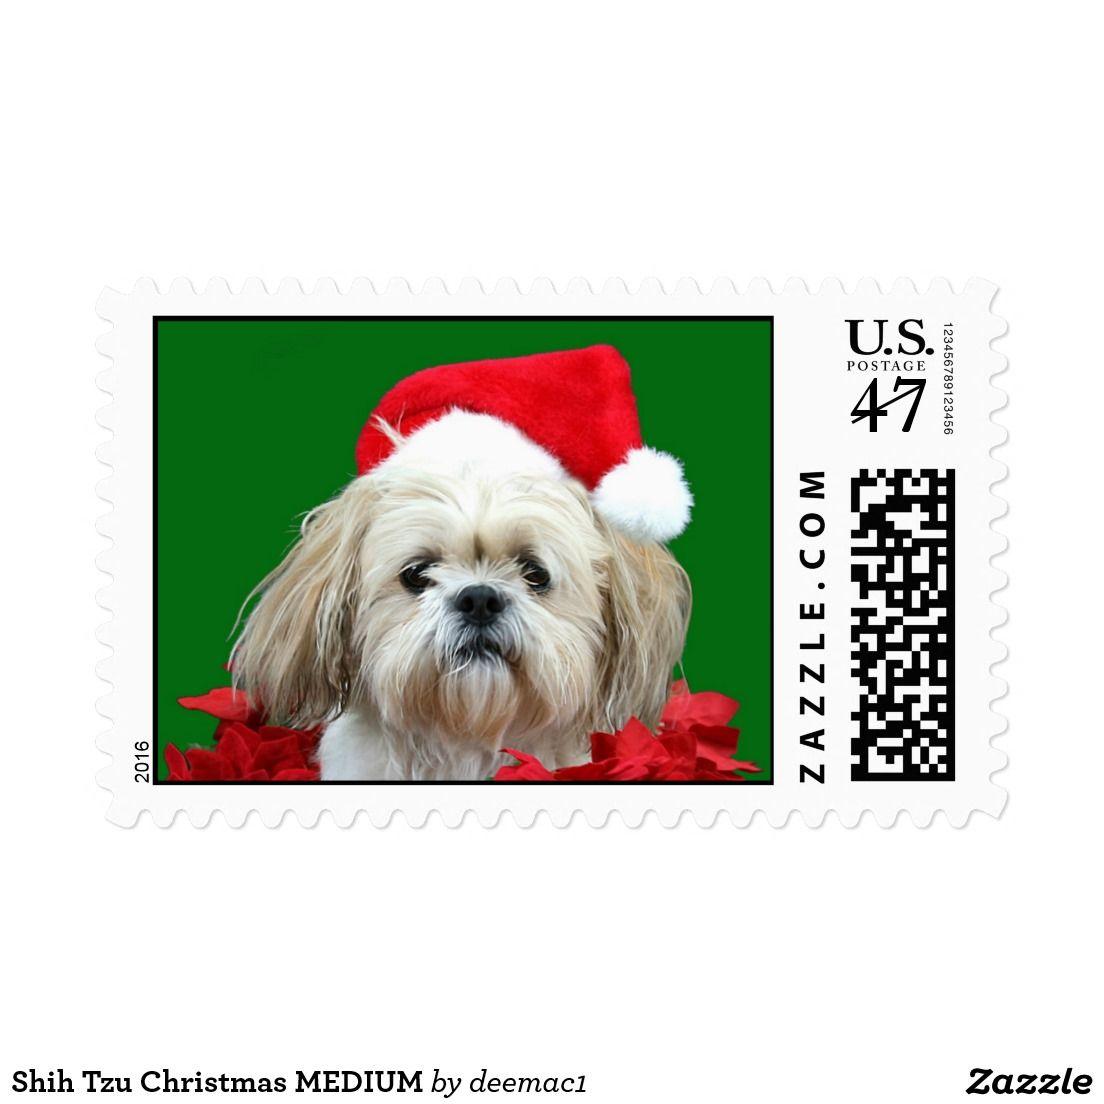 Shih Tzu Christmas MEDIUM Postage | Pinterest